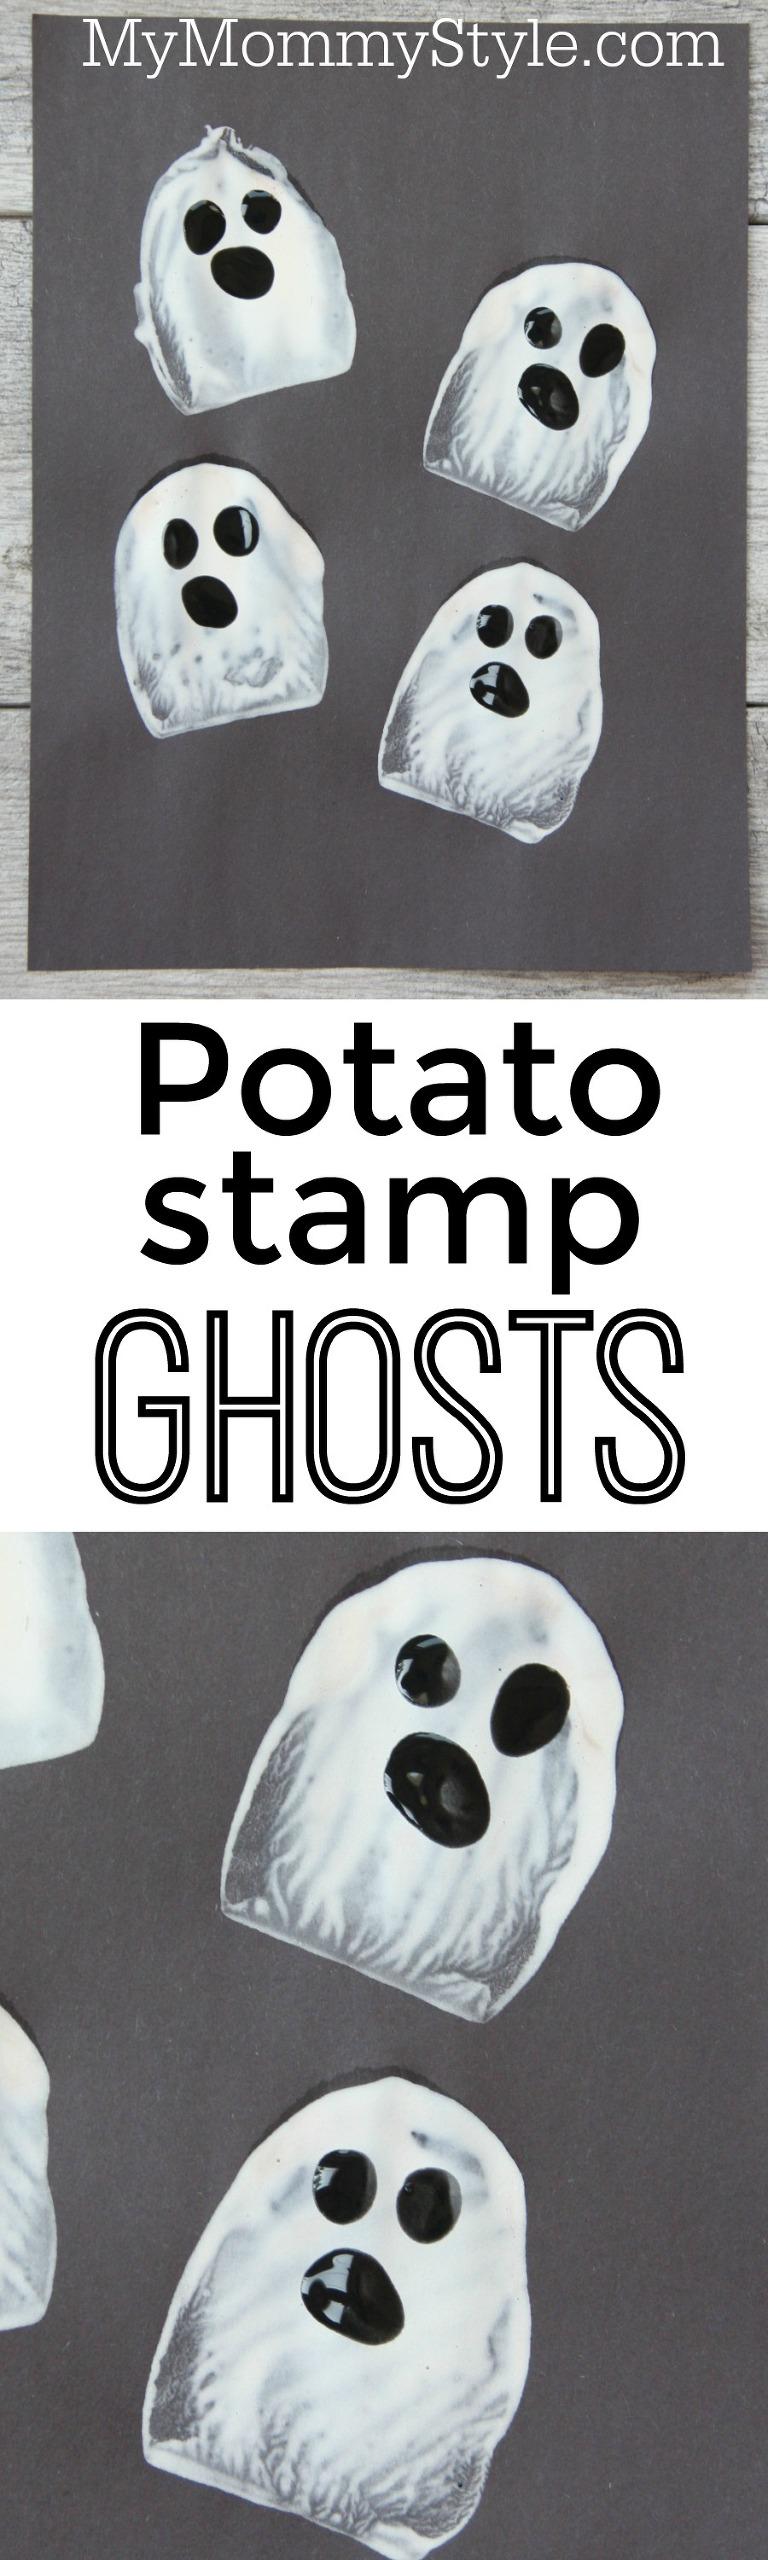 potato-stamp-ghosts